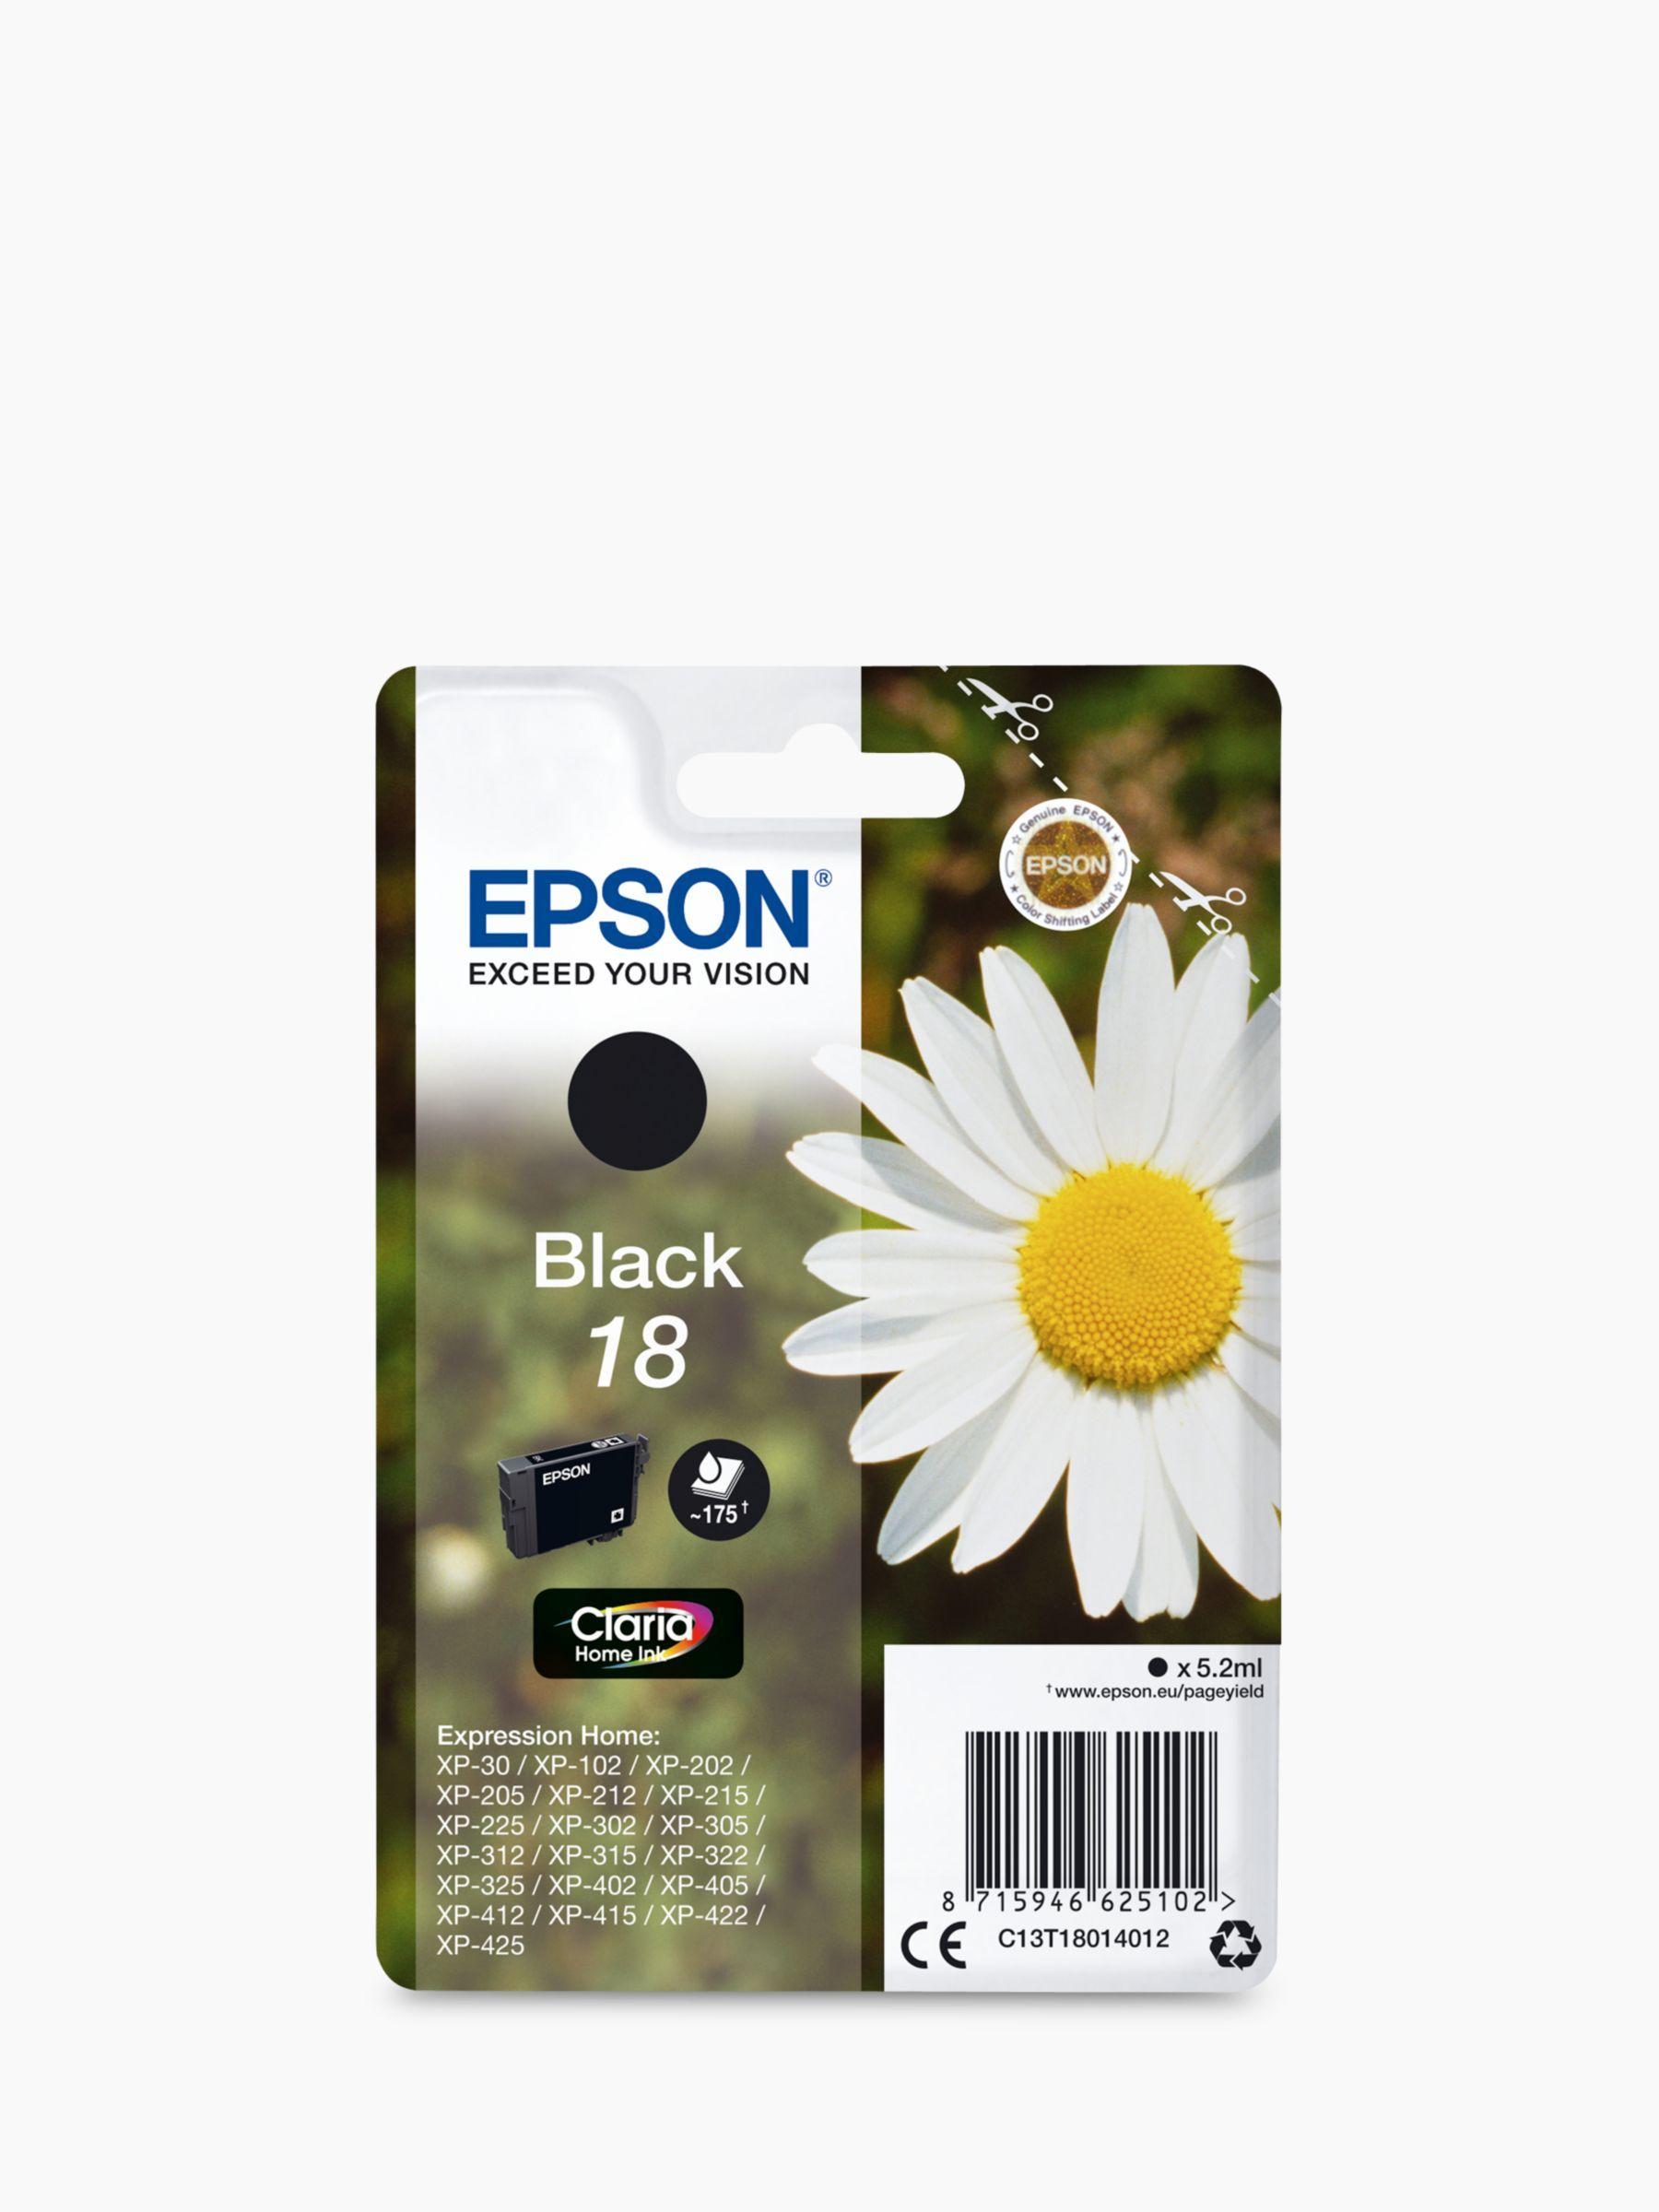 Epson Daisy T1801 Inkjet Printer Cartridge Black Printer